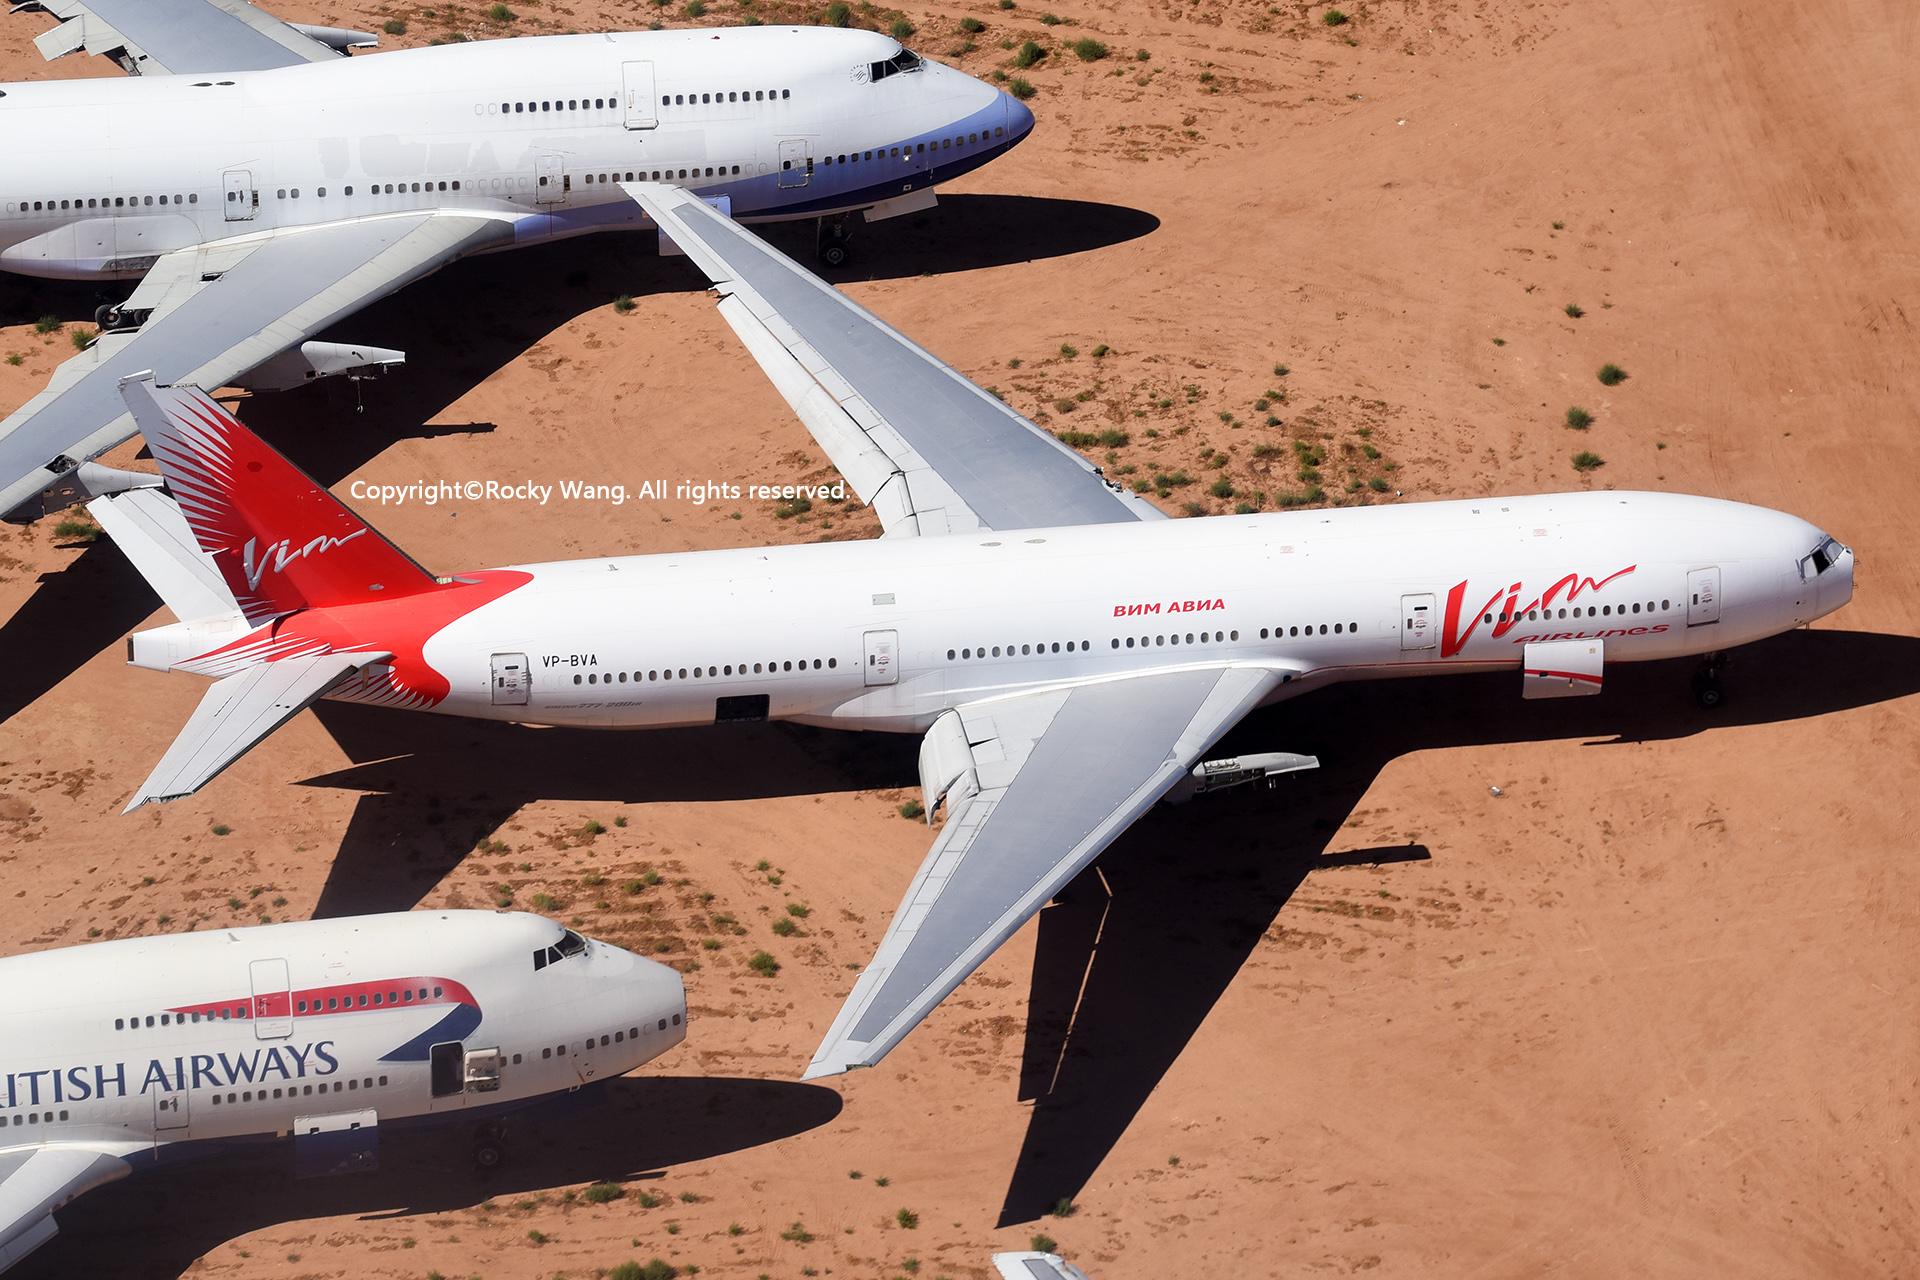 Re:[原创]沙漠29图+彩蛋 BOEING 777-2H6(ER) VP-BVA Victorville-Southern California Logistic